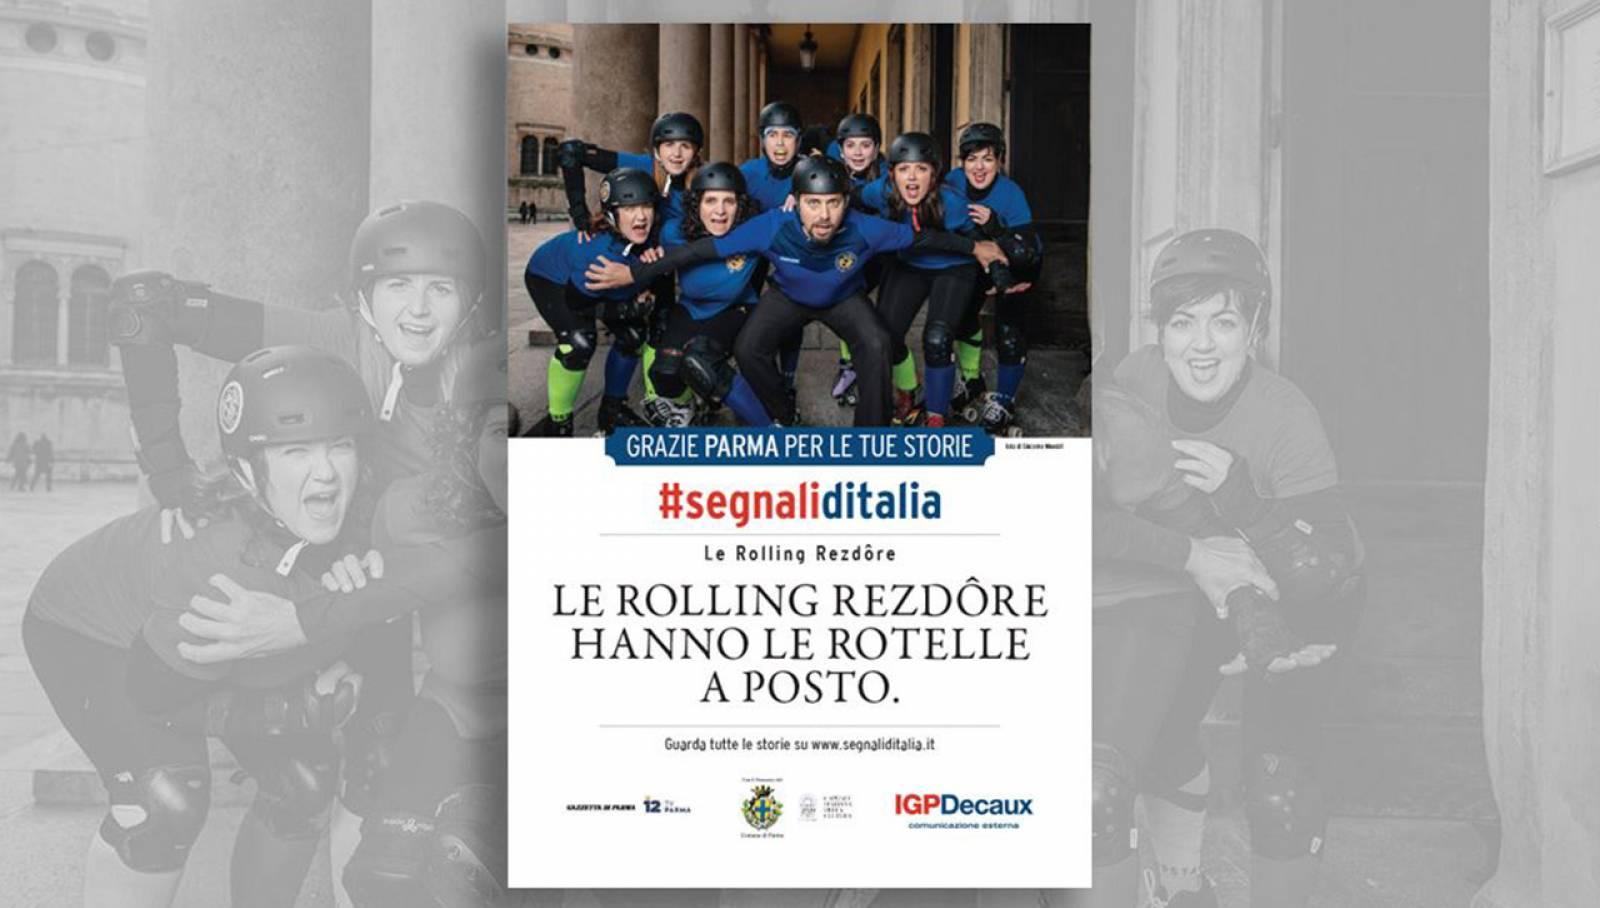 Segnali d'Italia thanks Campaign IGPDecaux Parma